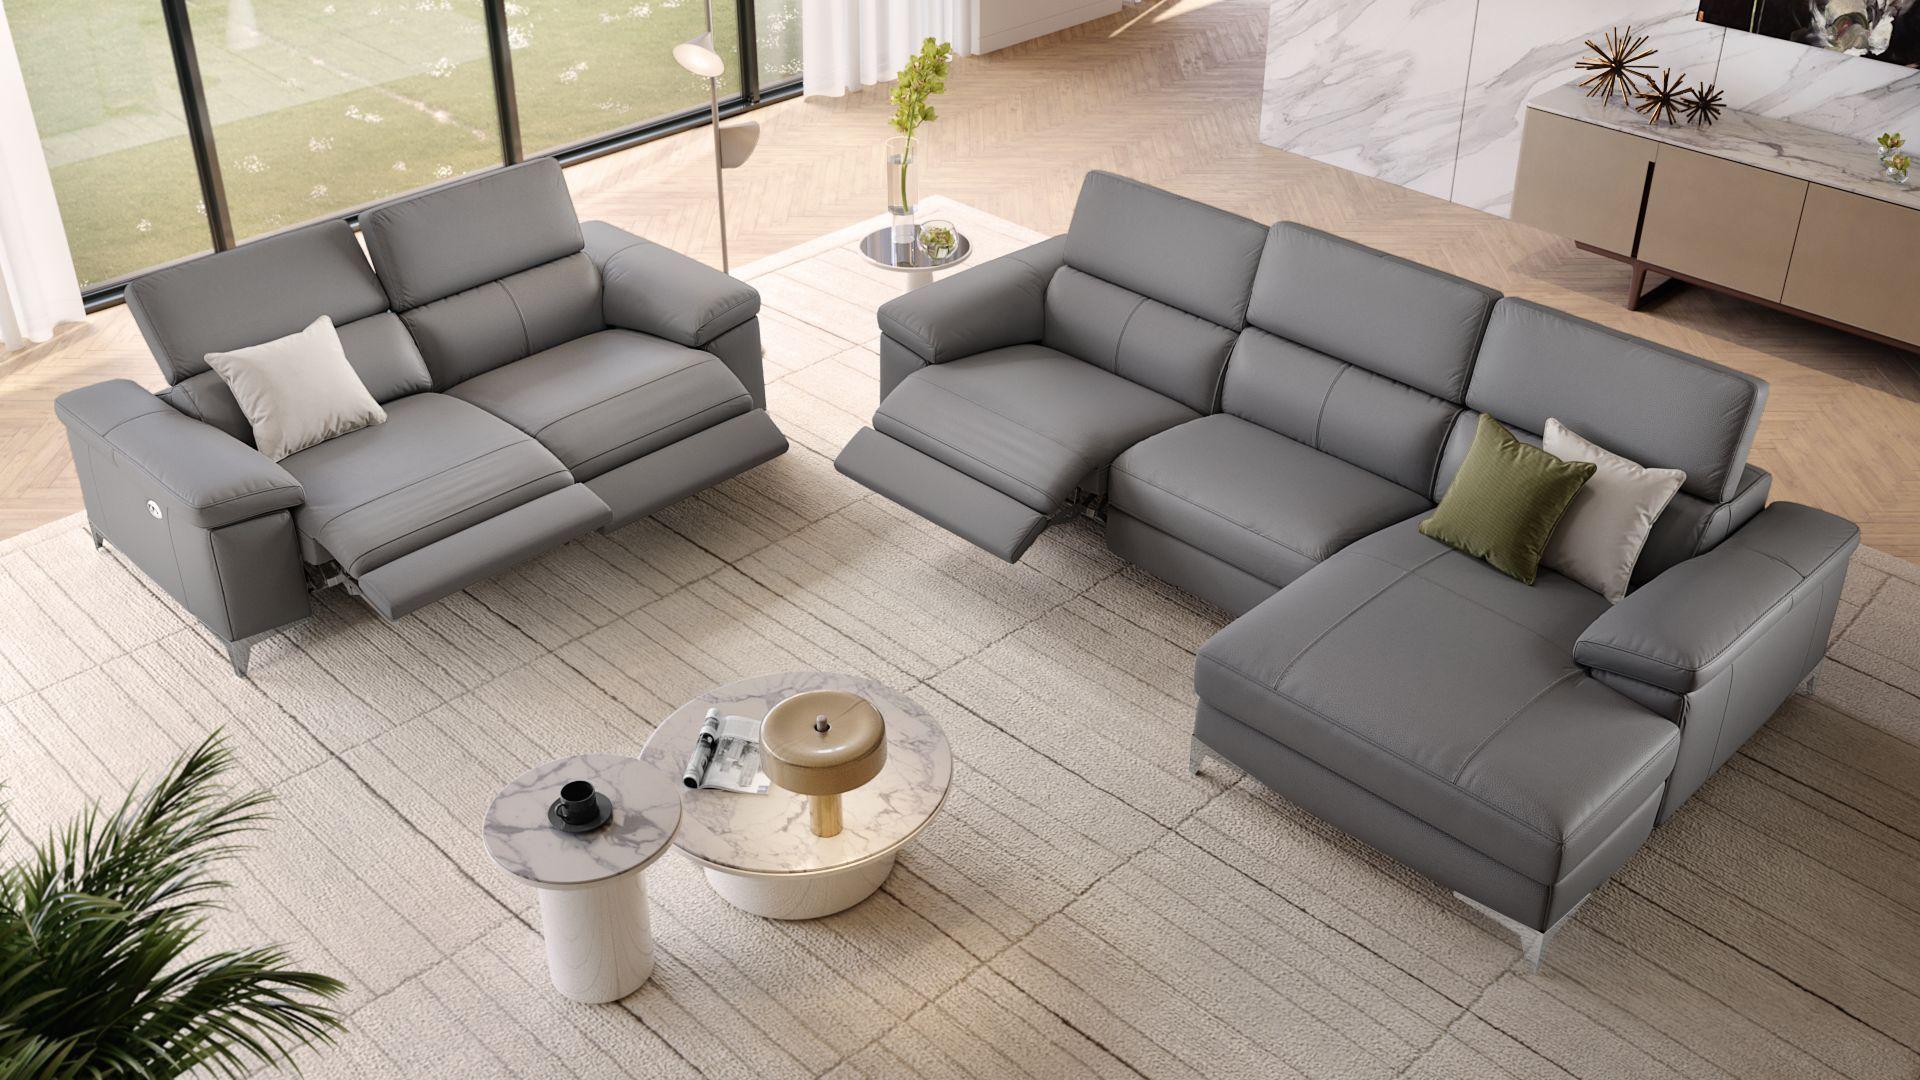 Leder Wohnlandschaft Ecksofa Venosa Sofanella Gartenmobel Sets Couch Sofa